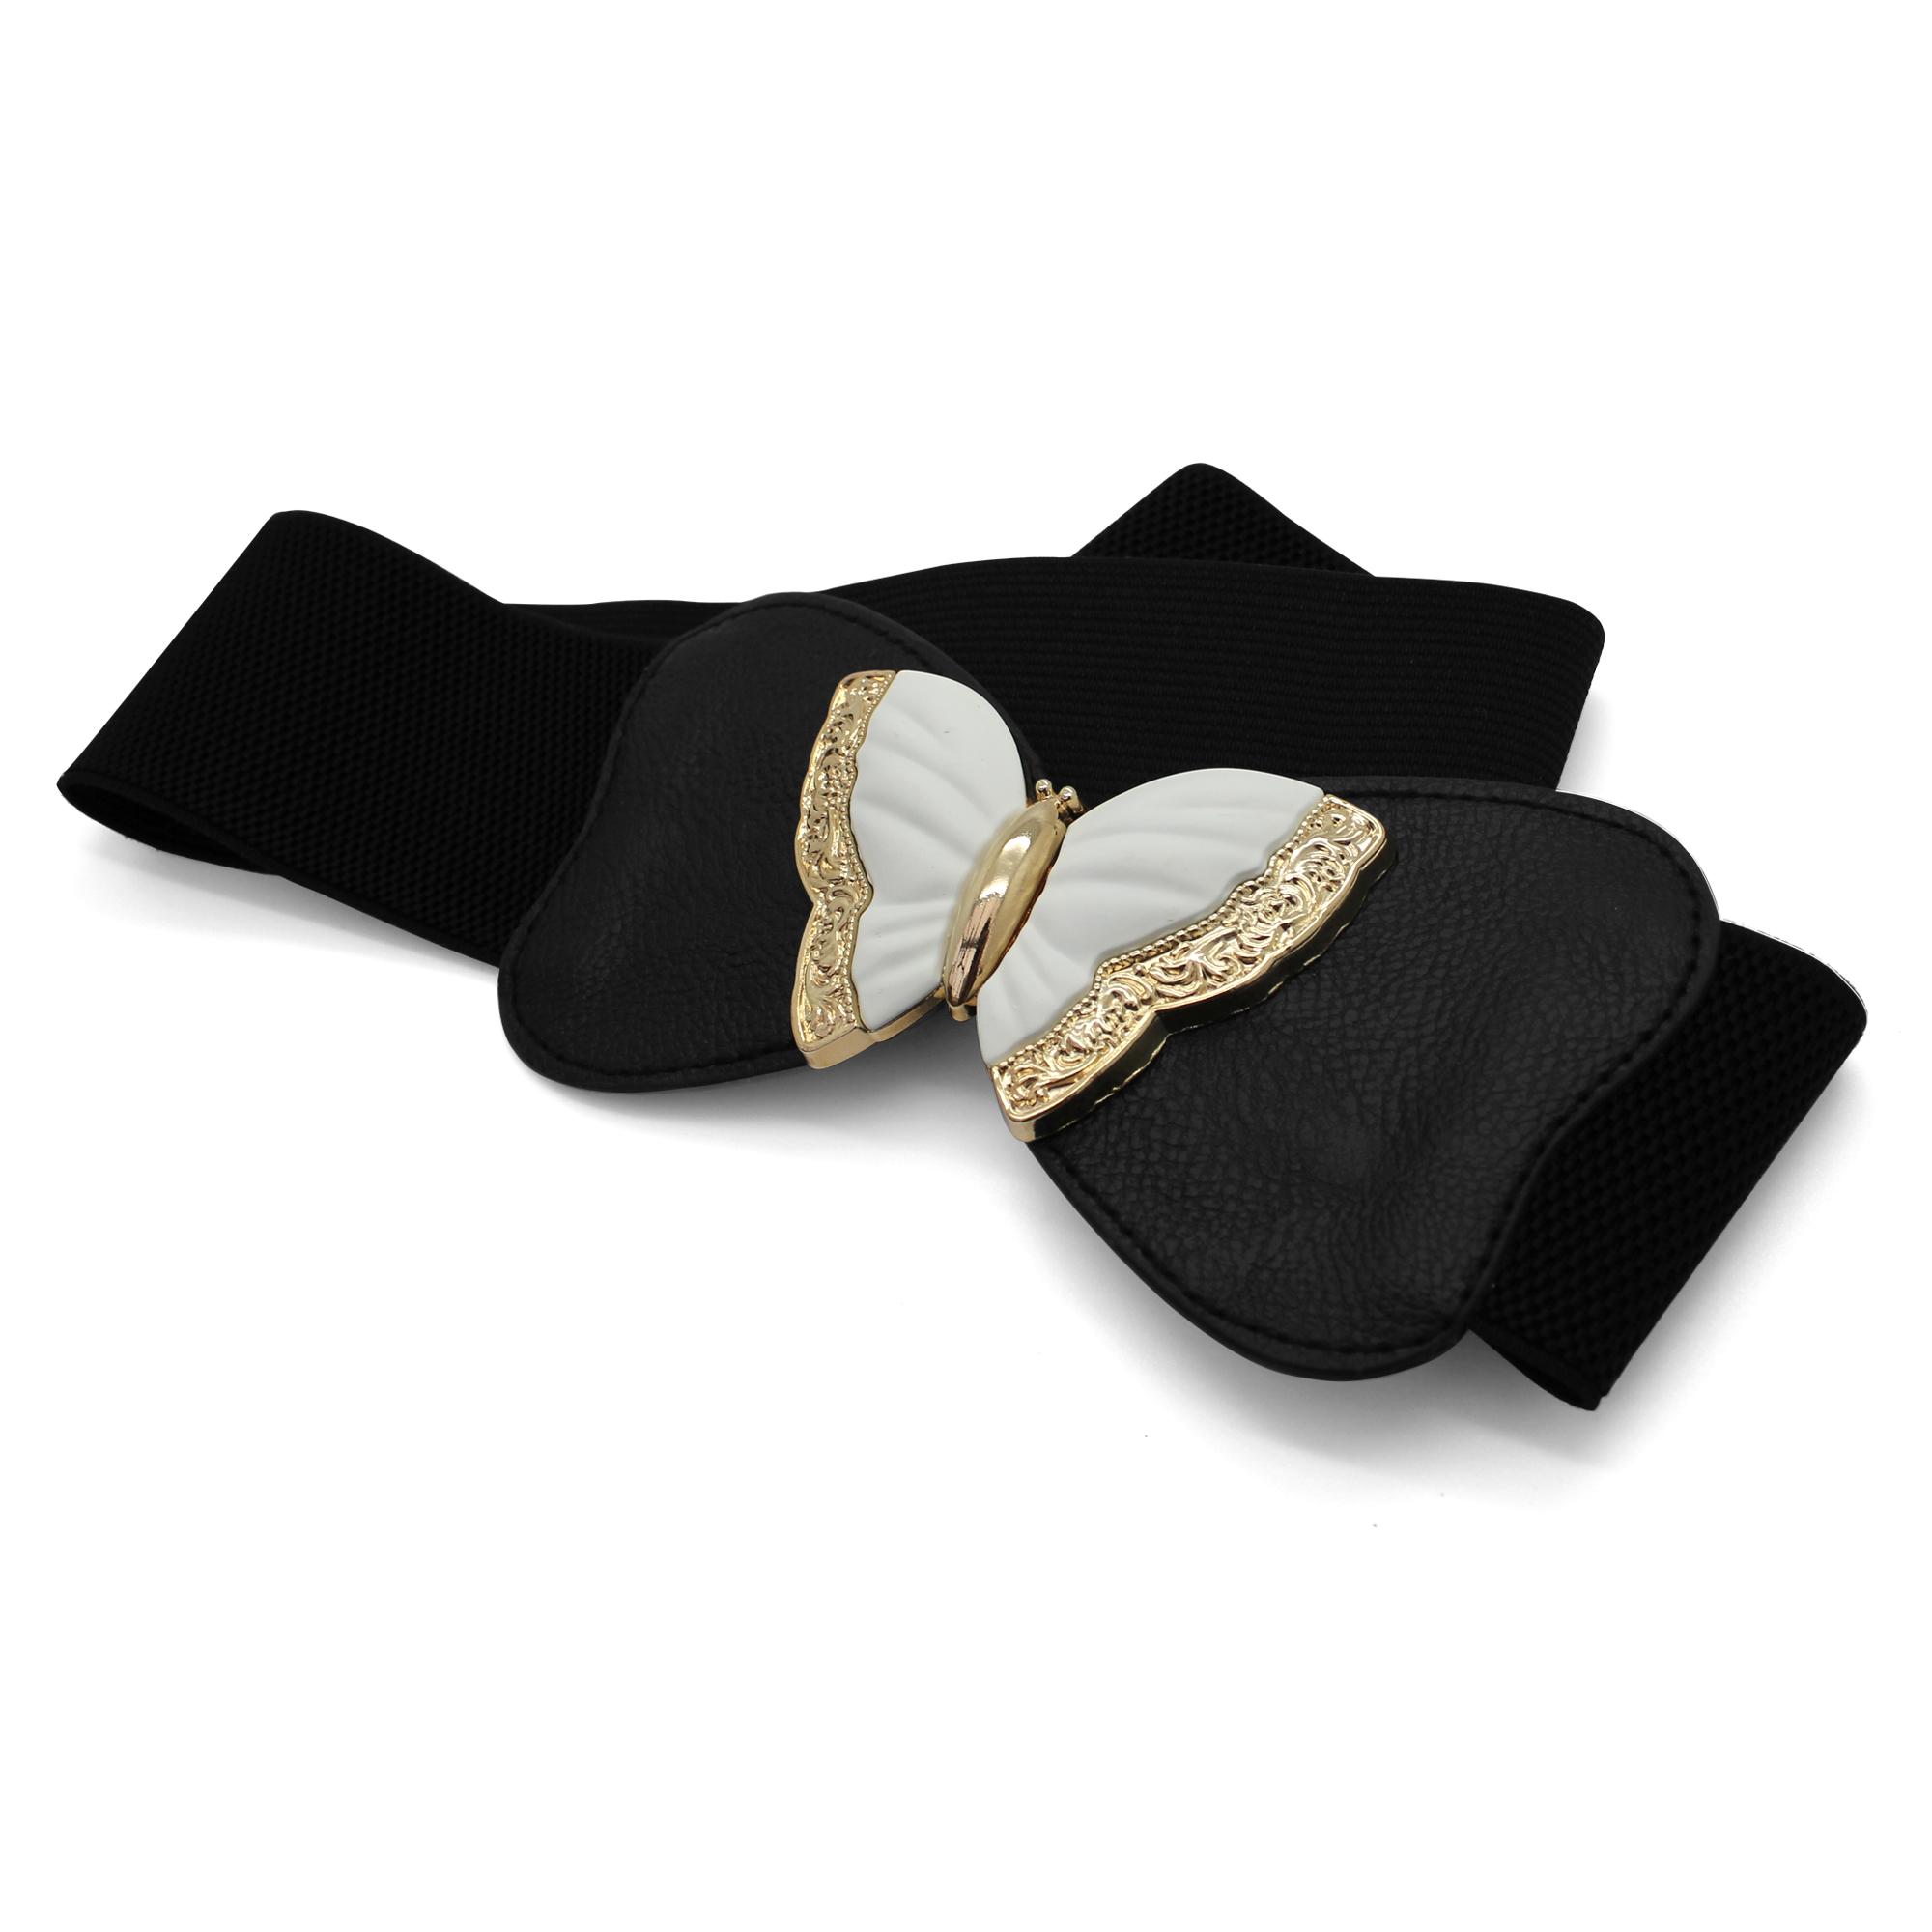 BlackButterfly Stretchy Elastic Butterfly Waist Belt